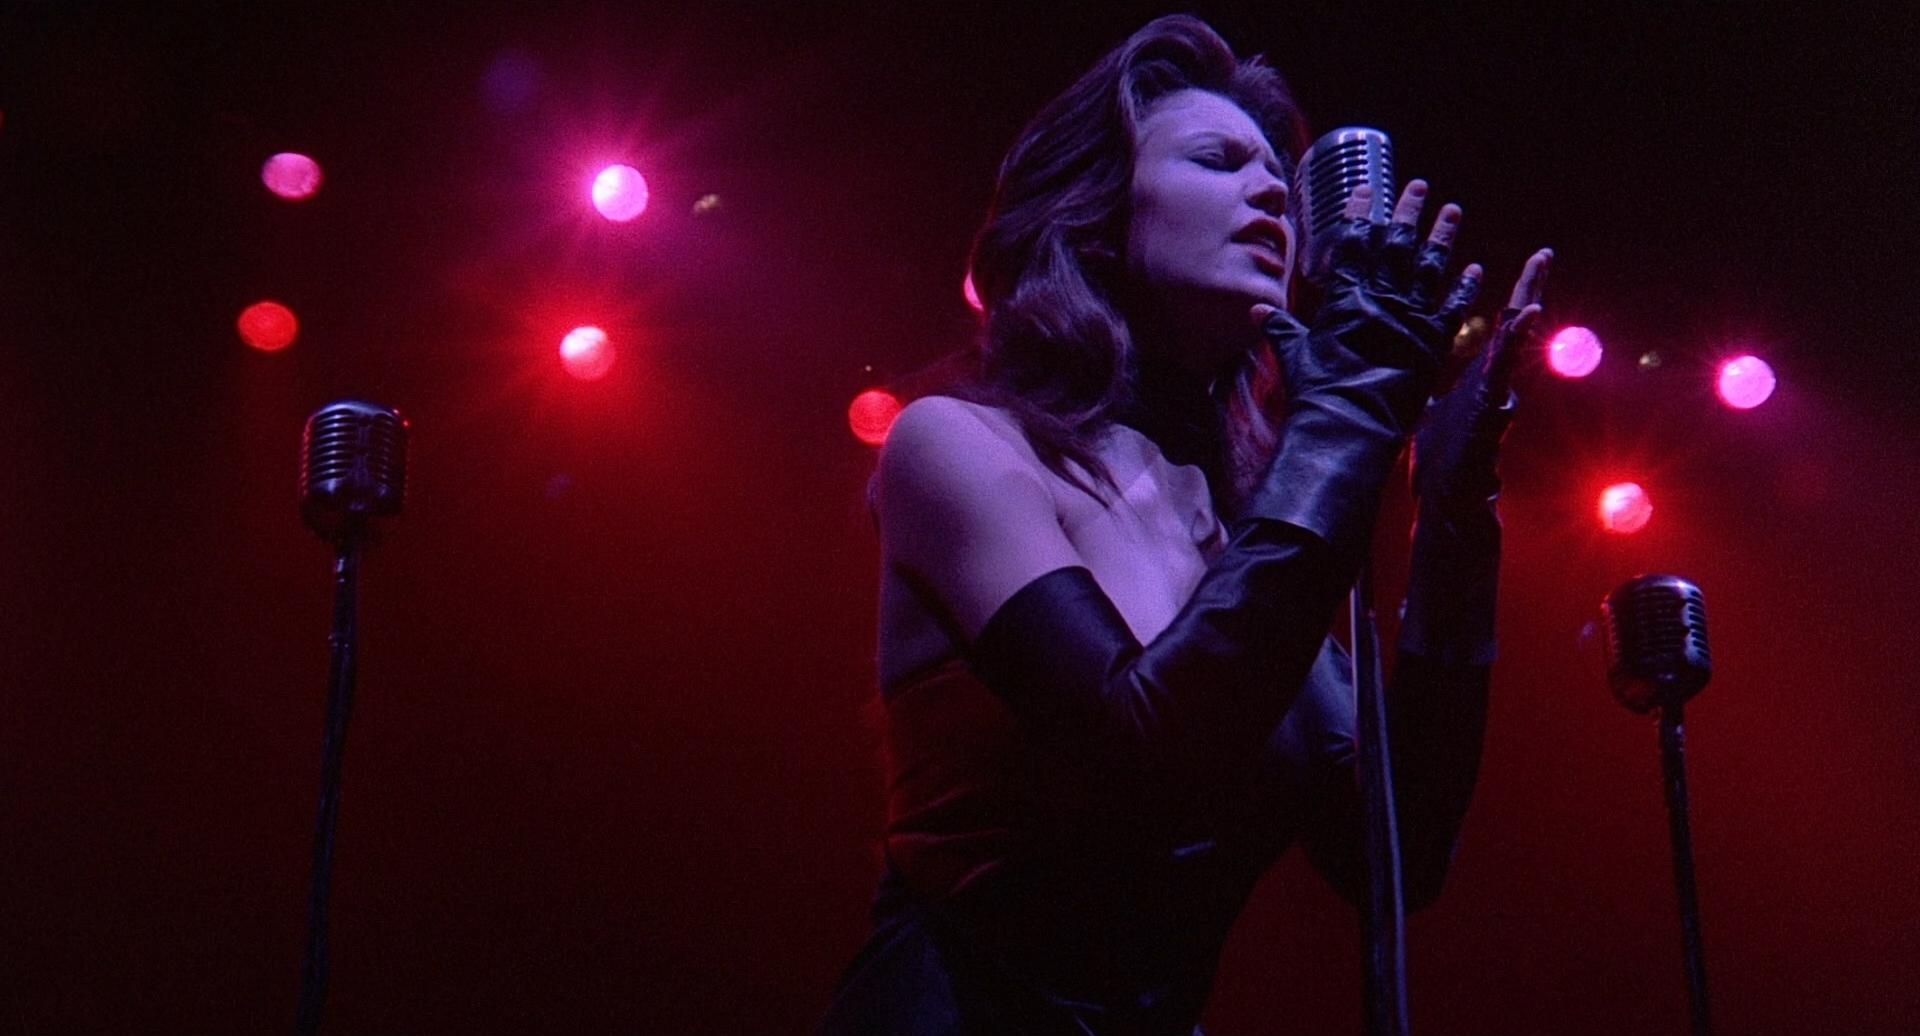 Streets of Fire – Diane Lane